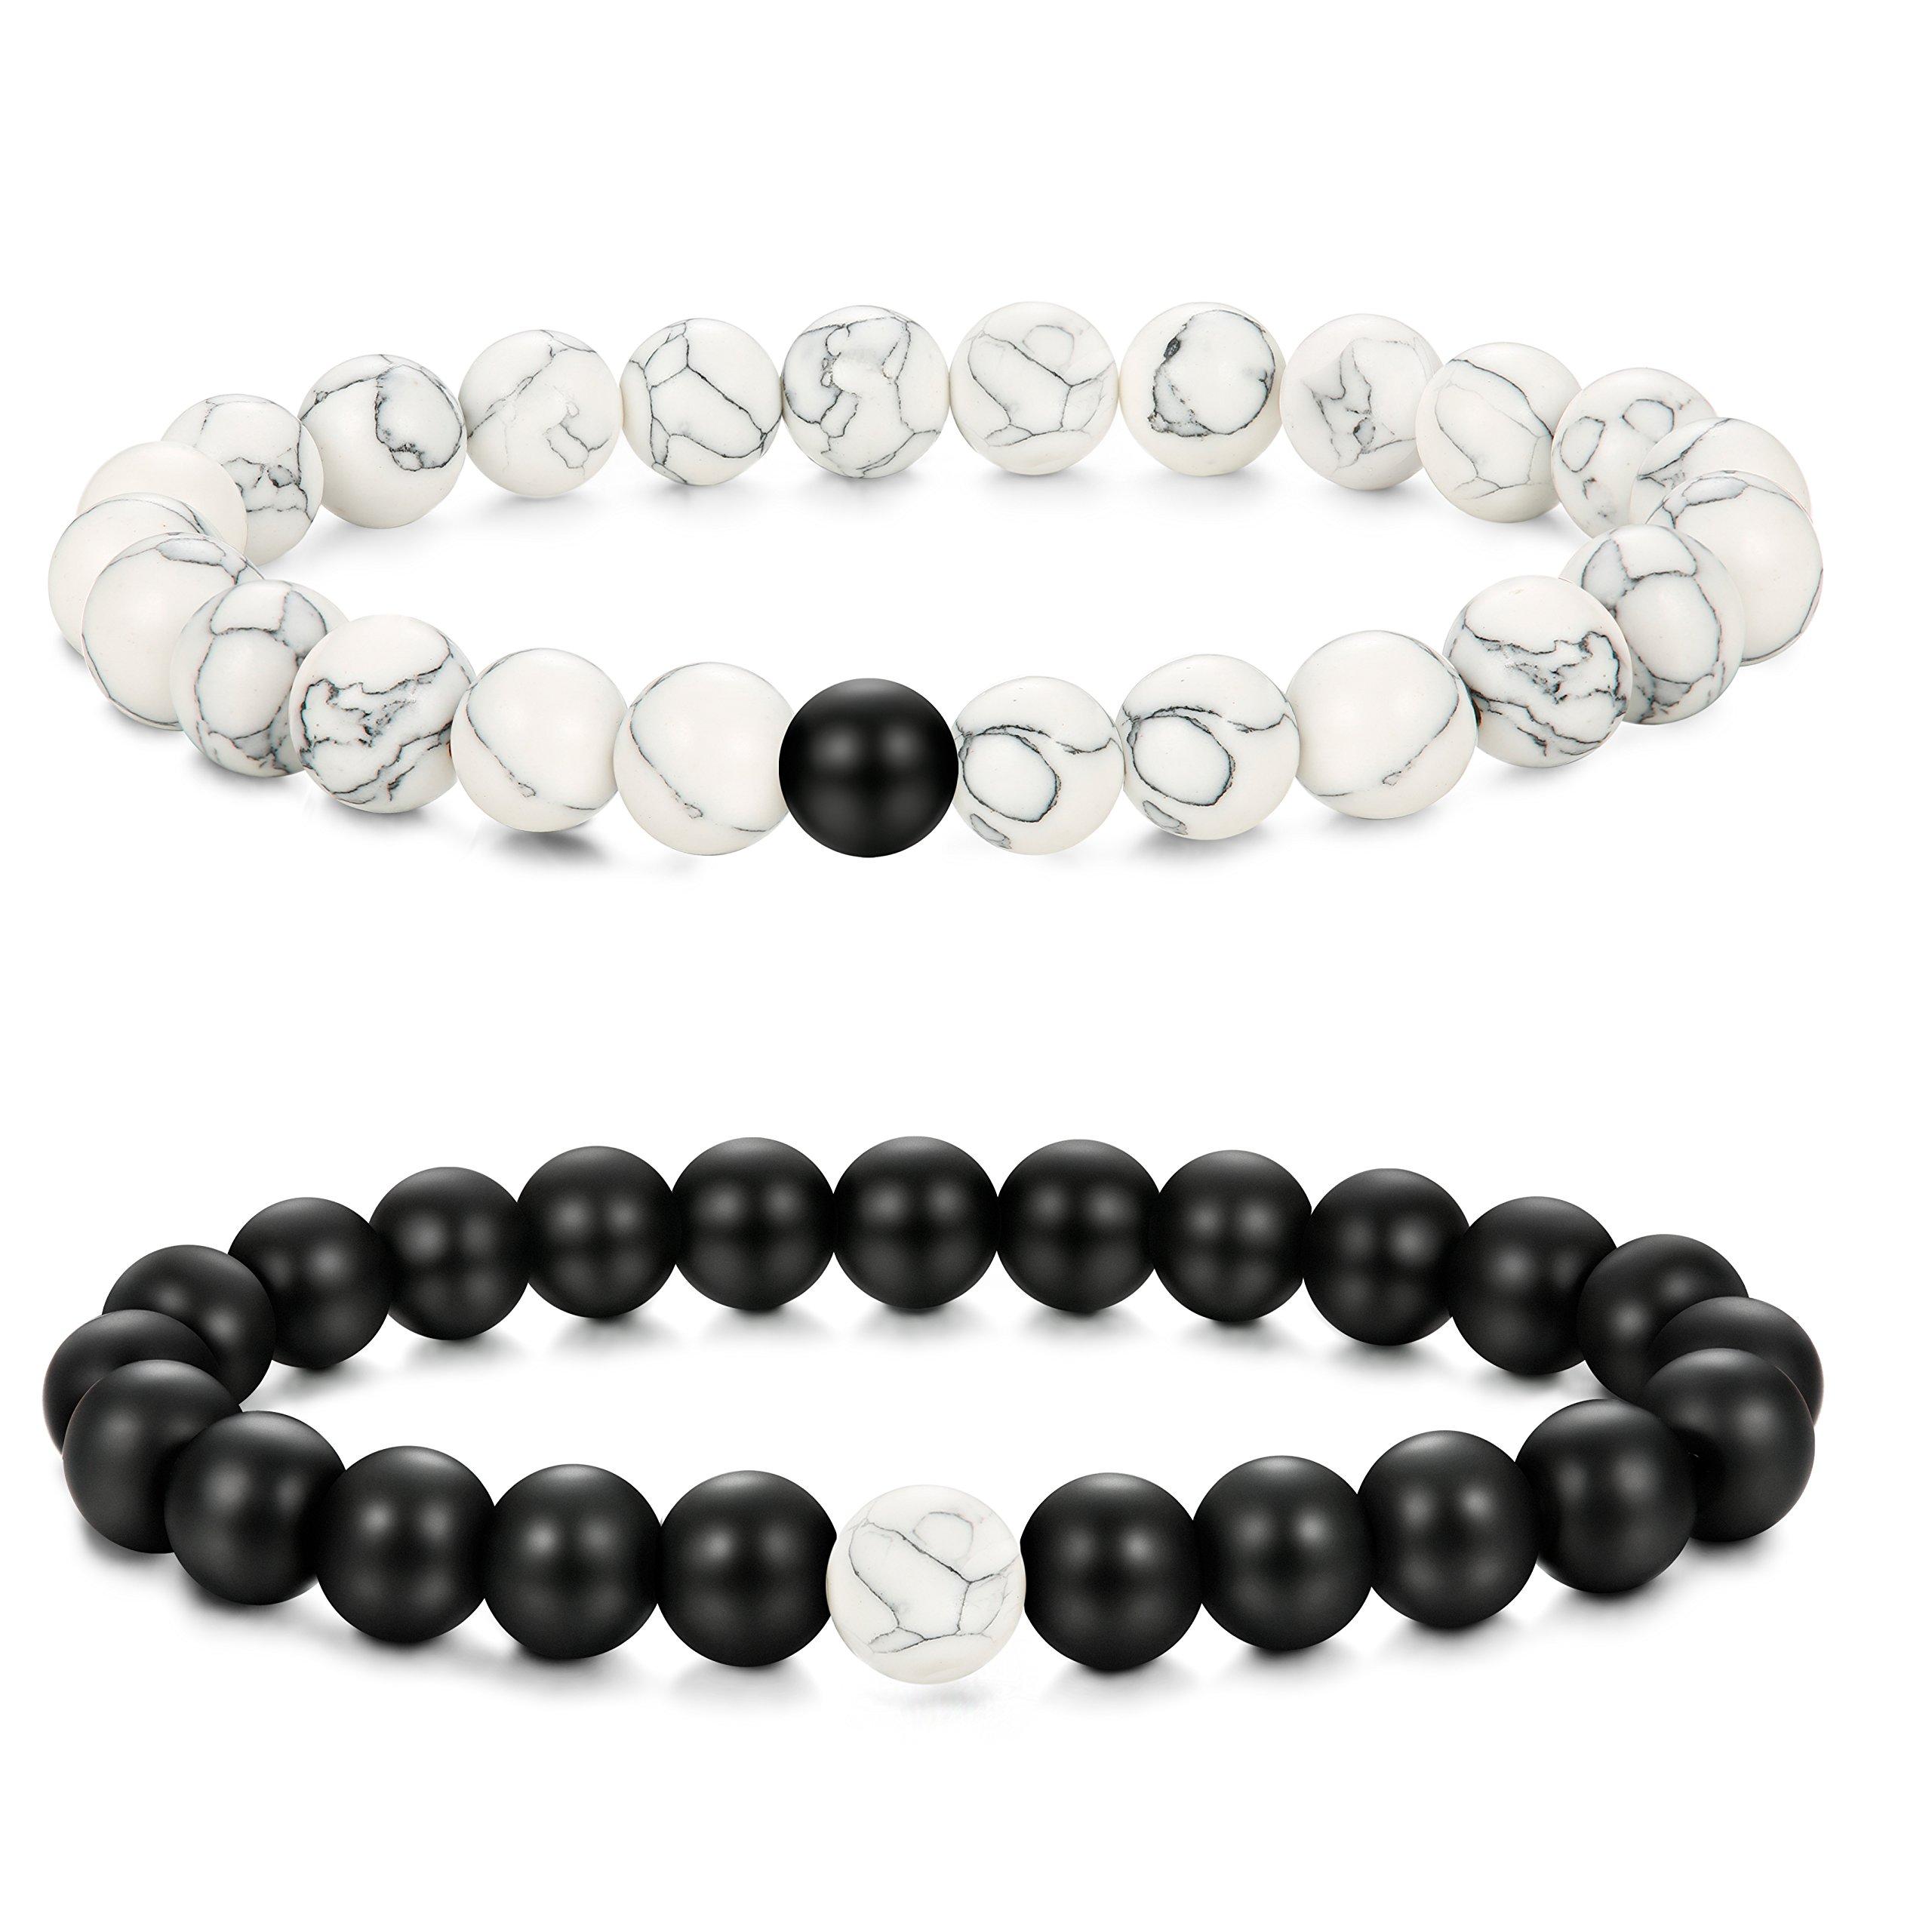 Jstyle Yin Yang Couples Necklace Bracelets for Women Mens Distance Leather Beaded Bracelet Adjustable 3Sets by Jstyle (Image #4)